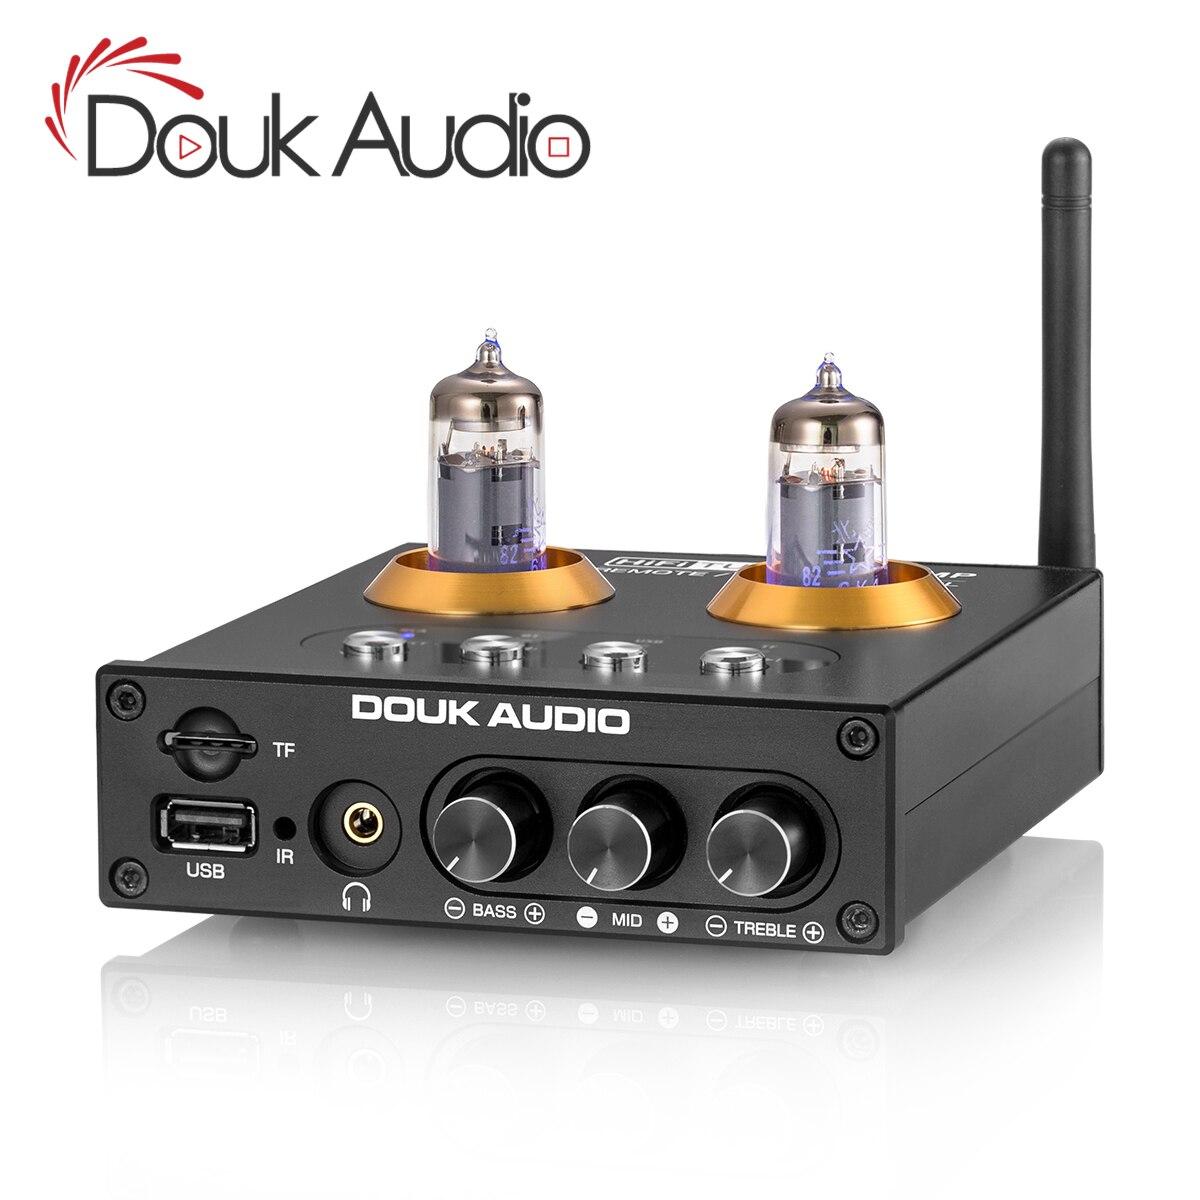 Douk Audio Mini Bluetooth 5.0 Vacuum Tube Preamp HiFi Stereo Audio Receiver USB Music Player Headphone Amplifier TF Card